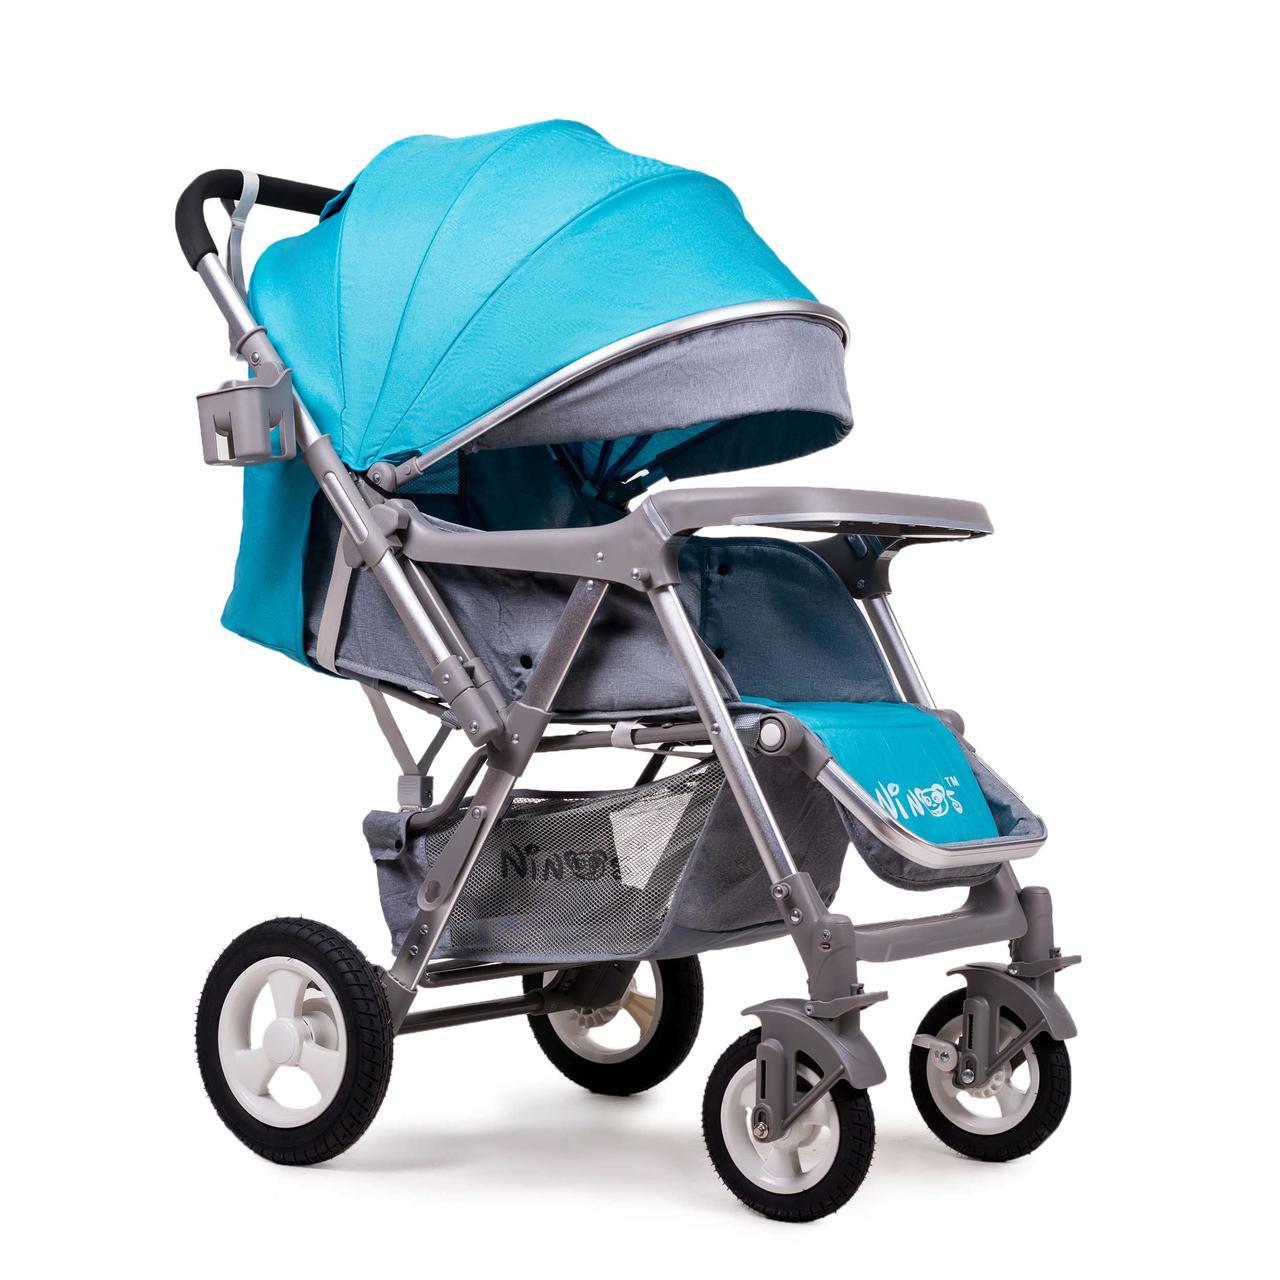 Прогулочная коляска Ninos Light Blue (Maxi)